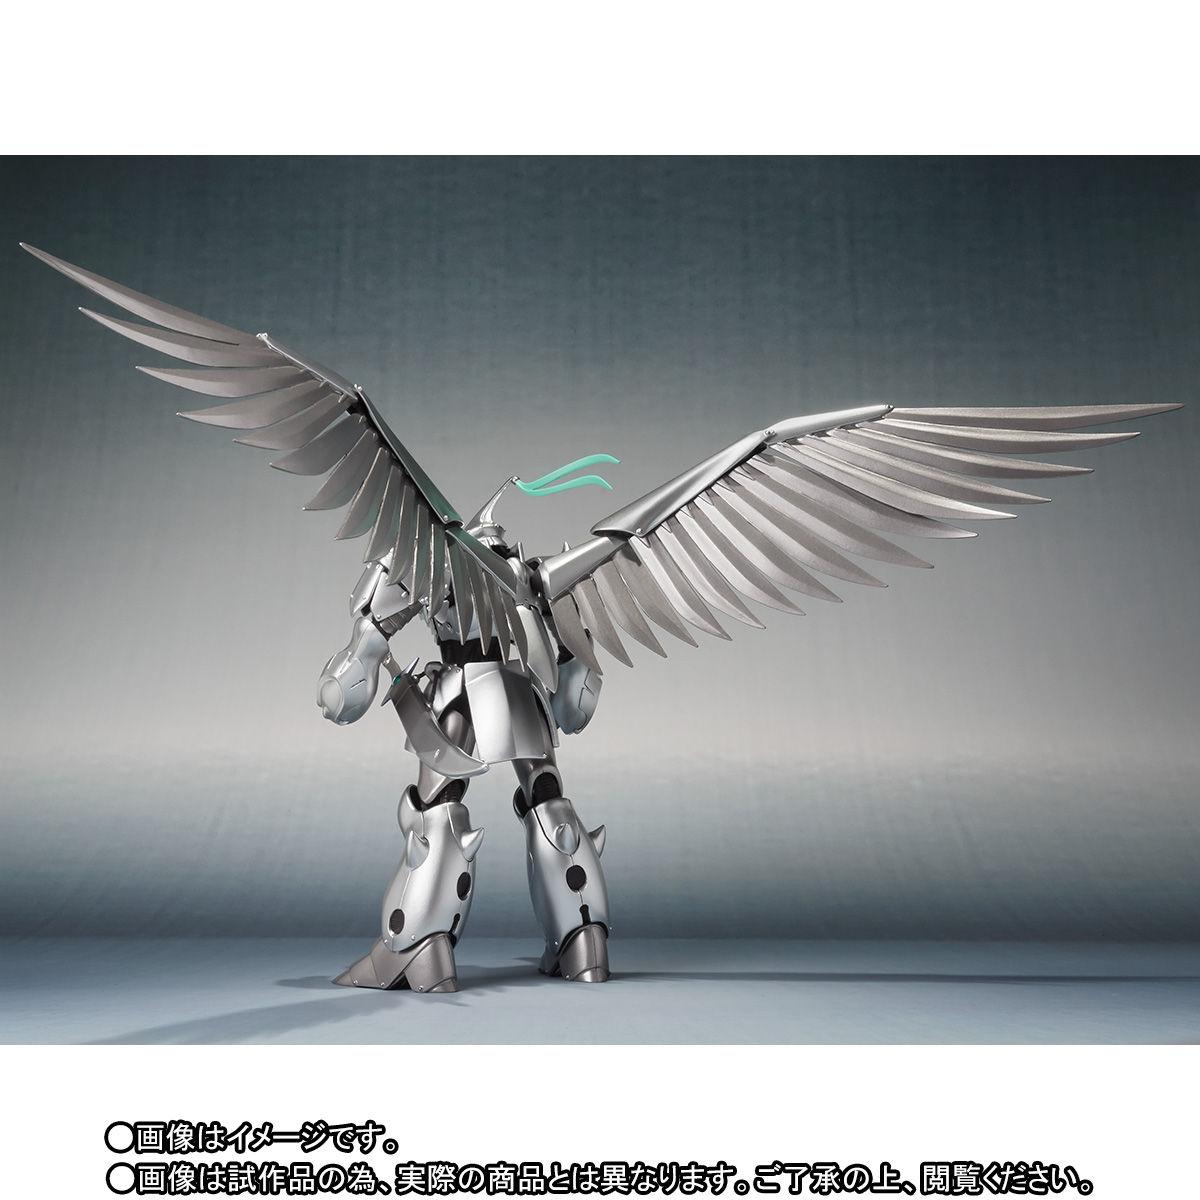 ROBOT魂〈SIDE PB〉『飛甲兵』機甲界ガリアン 鉄の紋章 可動フィギュア-002